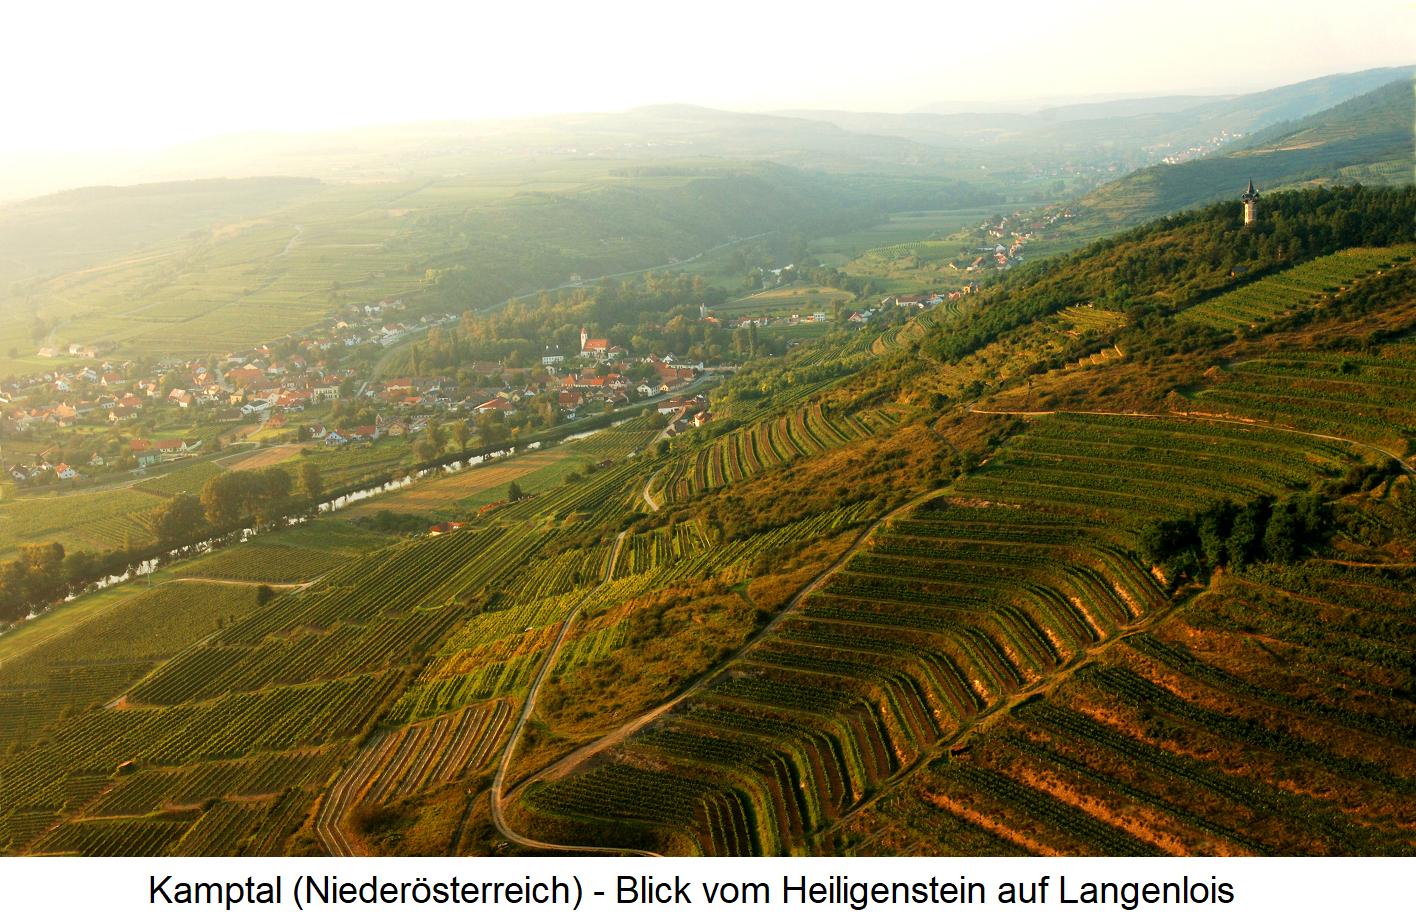 Langenlois - View of the Langenlois from Heiligenstein